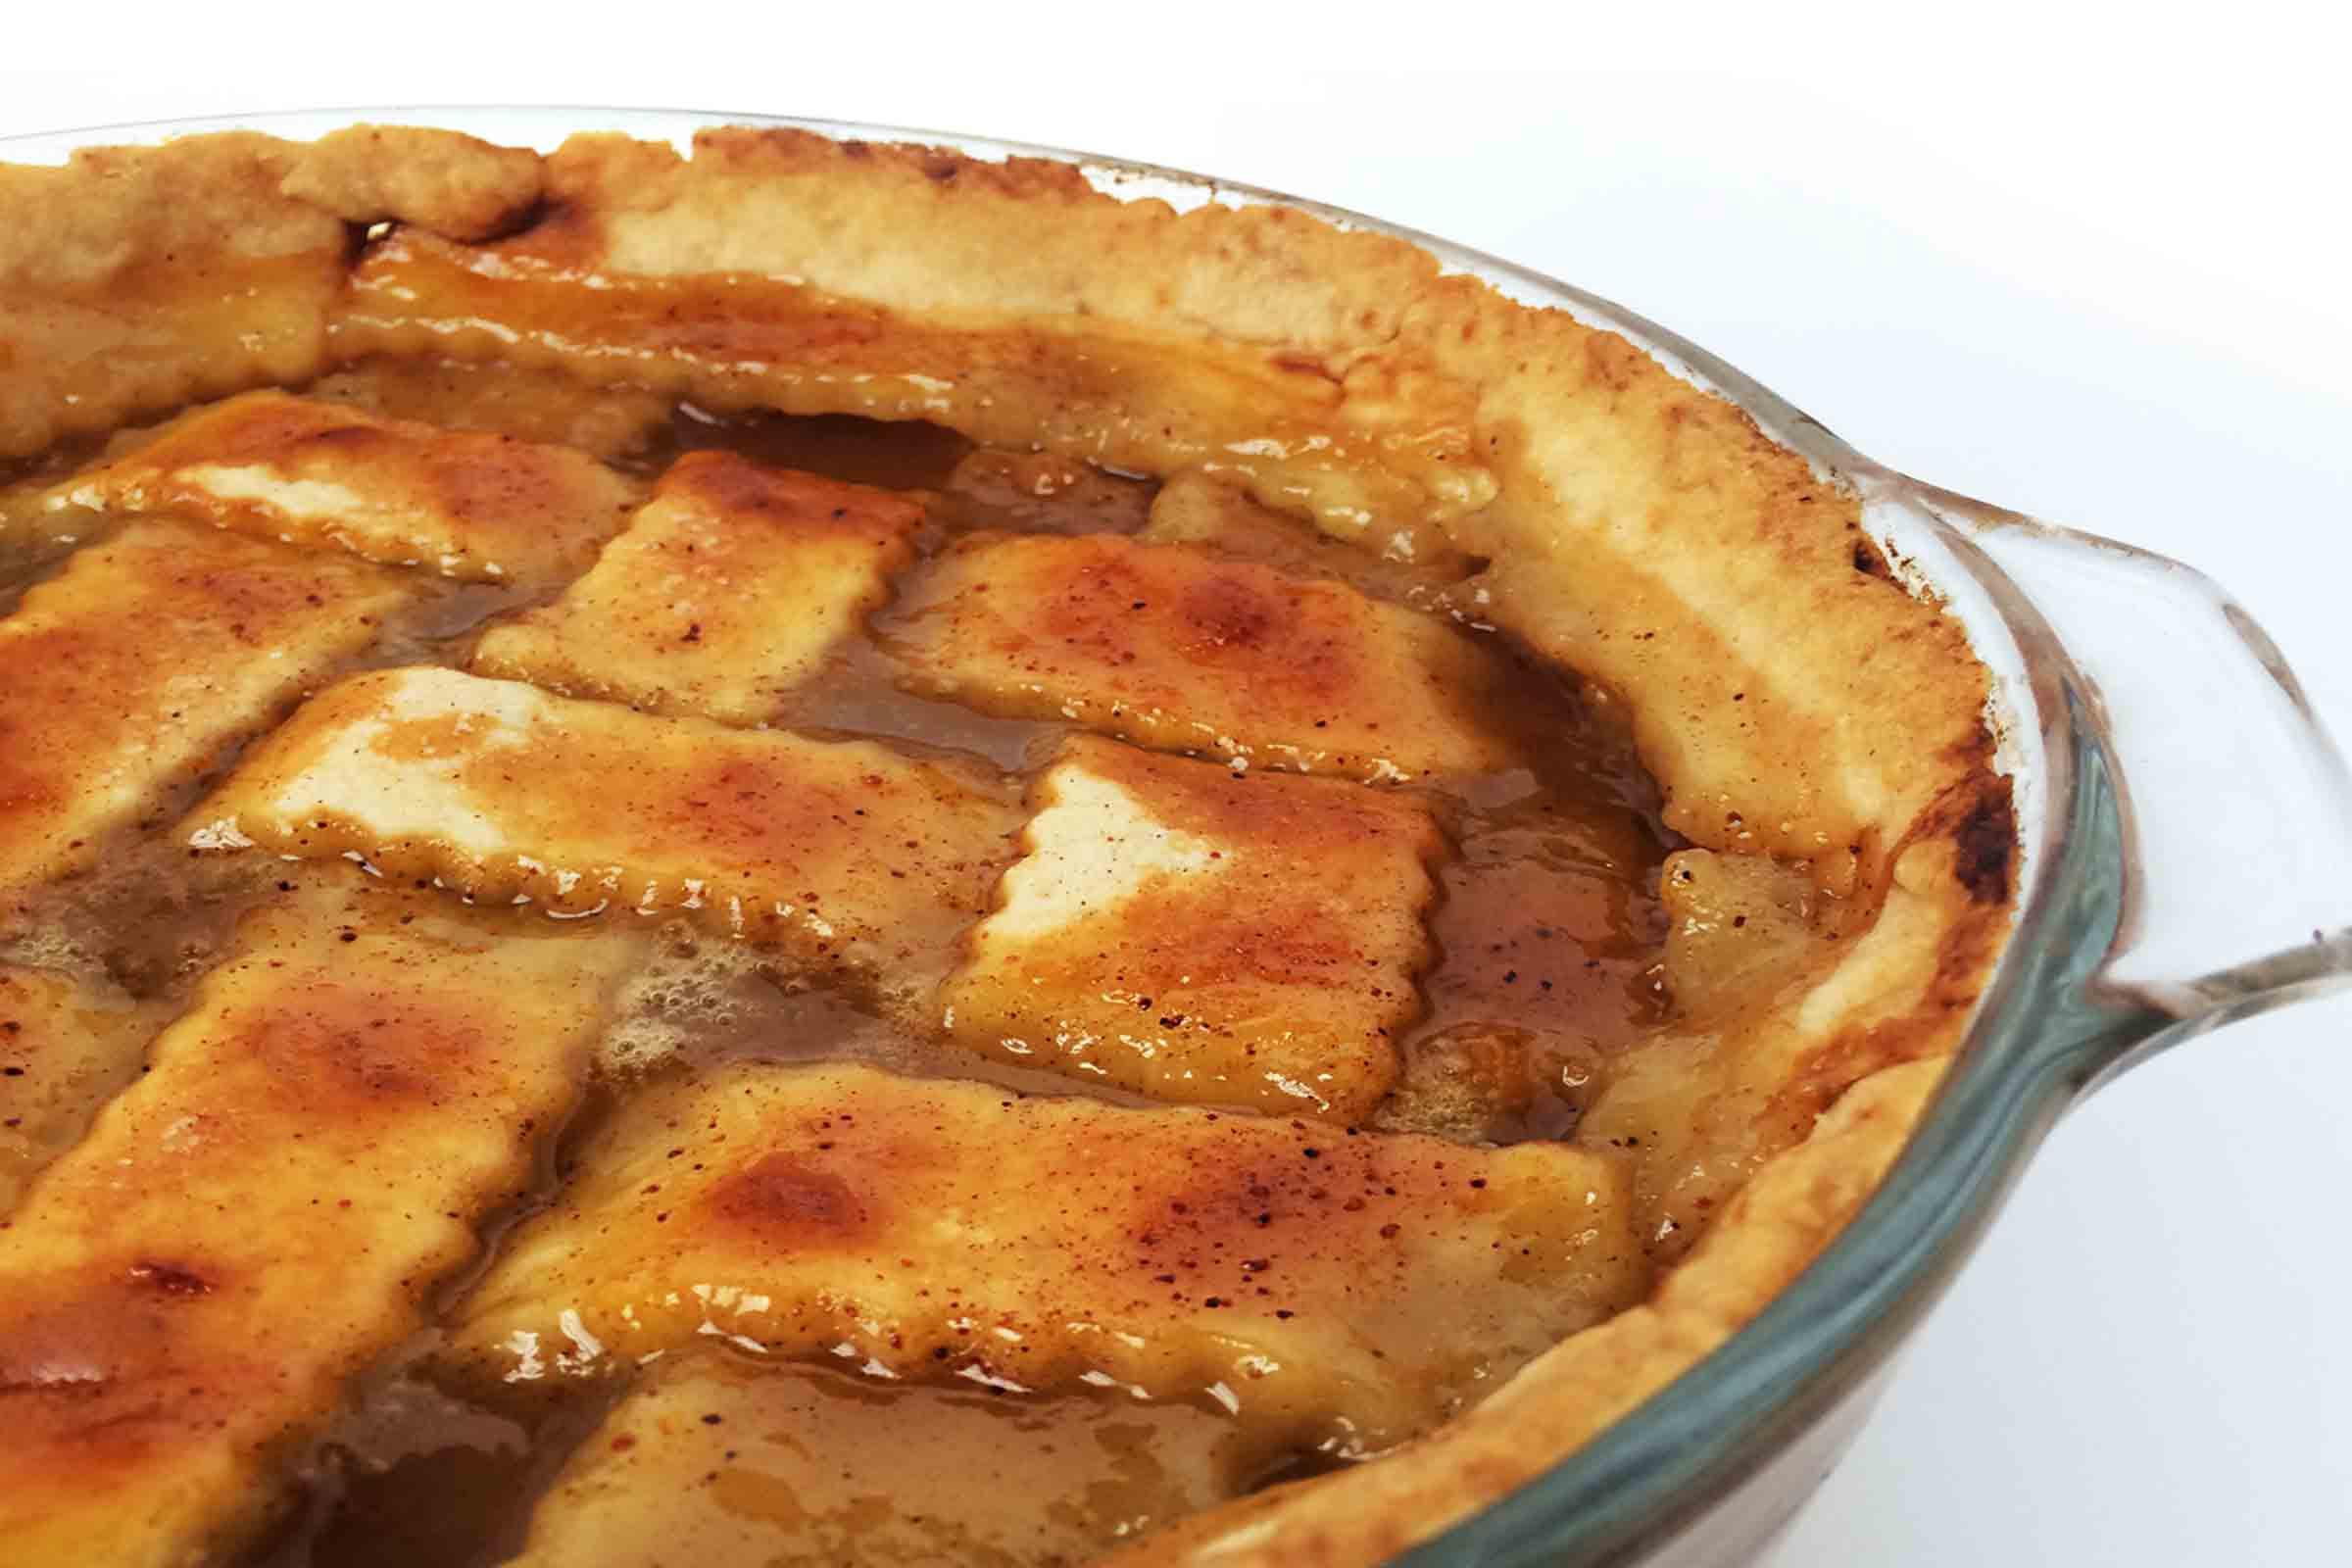 Peach Cobbler With Pie Crust  Double Crust Peach Cobbler – Full